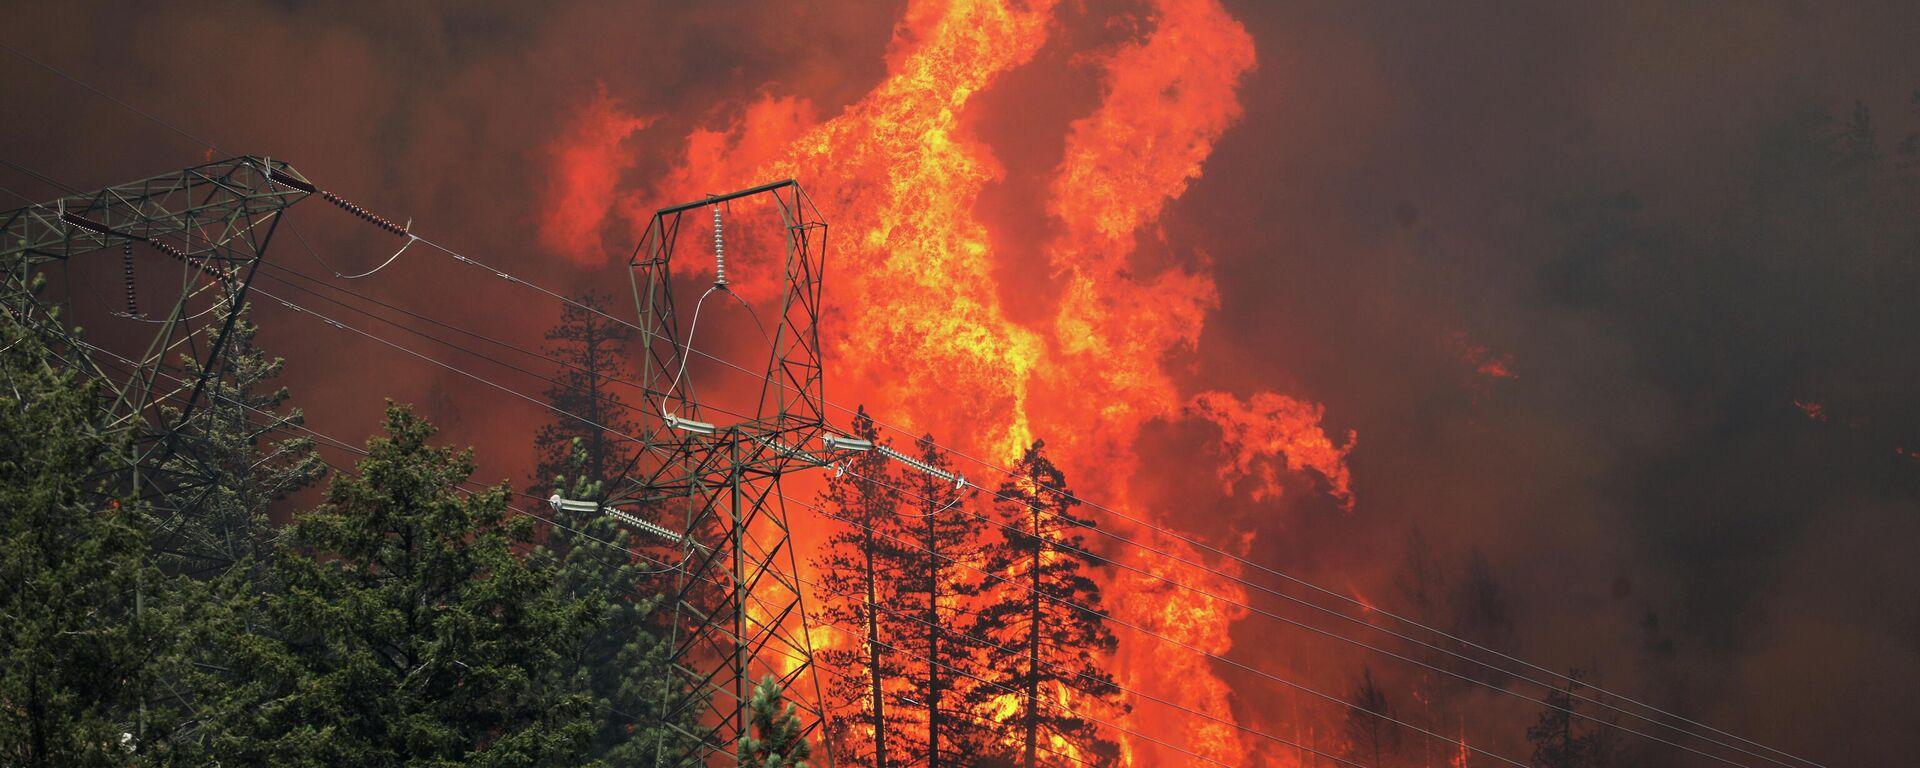 Waldbrände in den USA - SNA, 1920, 18.07.2021